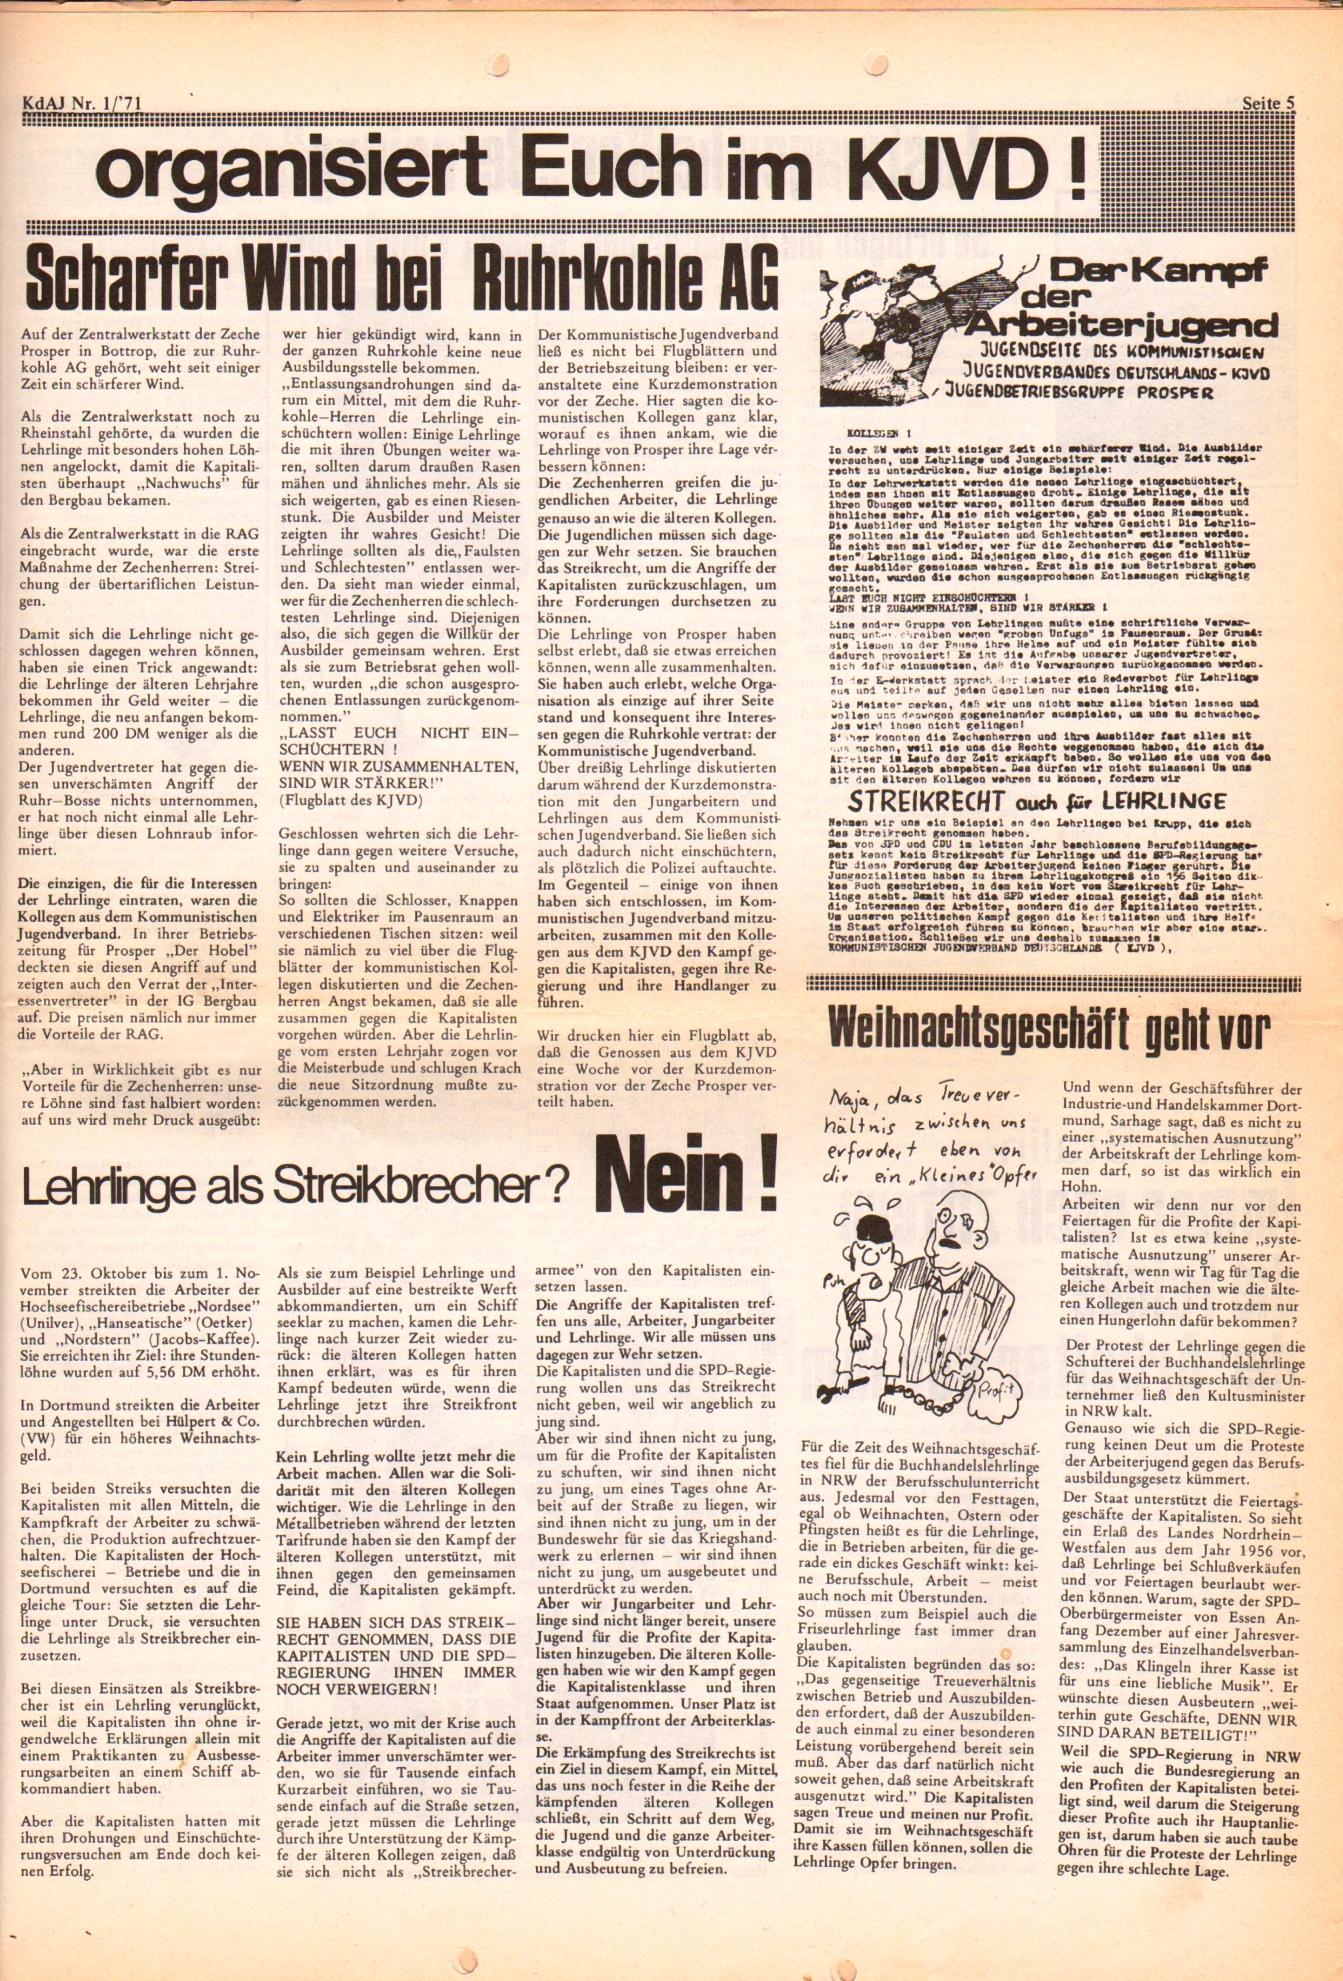 KDAJ, 2. Jg., Januar 1971, Nr. 1, Seite 5